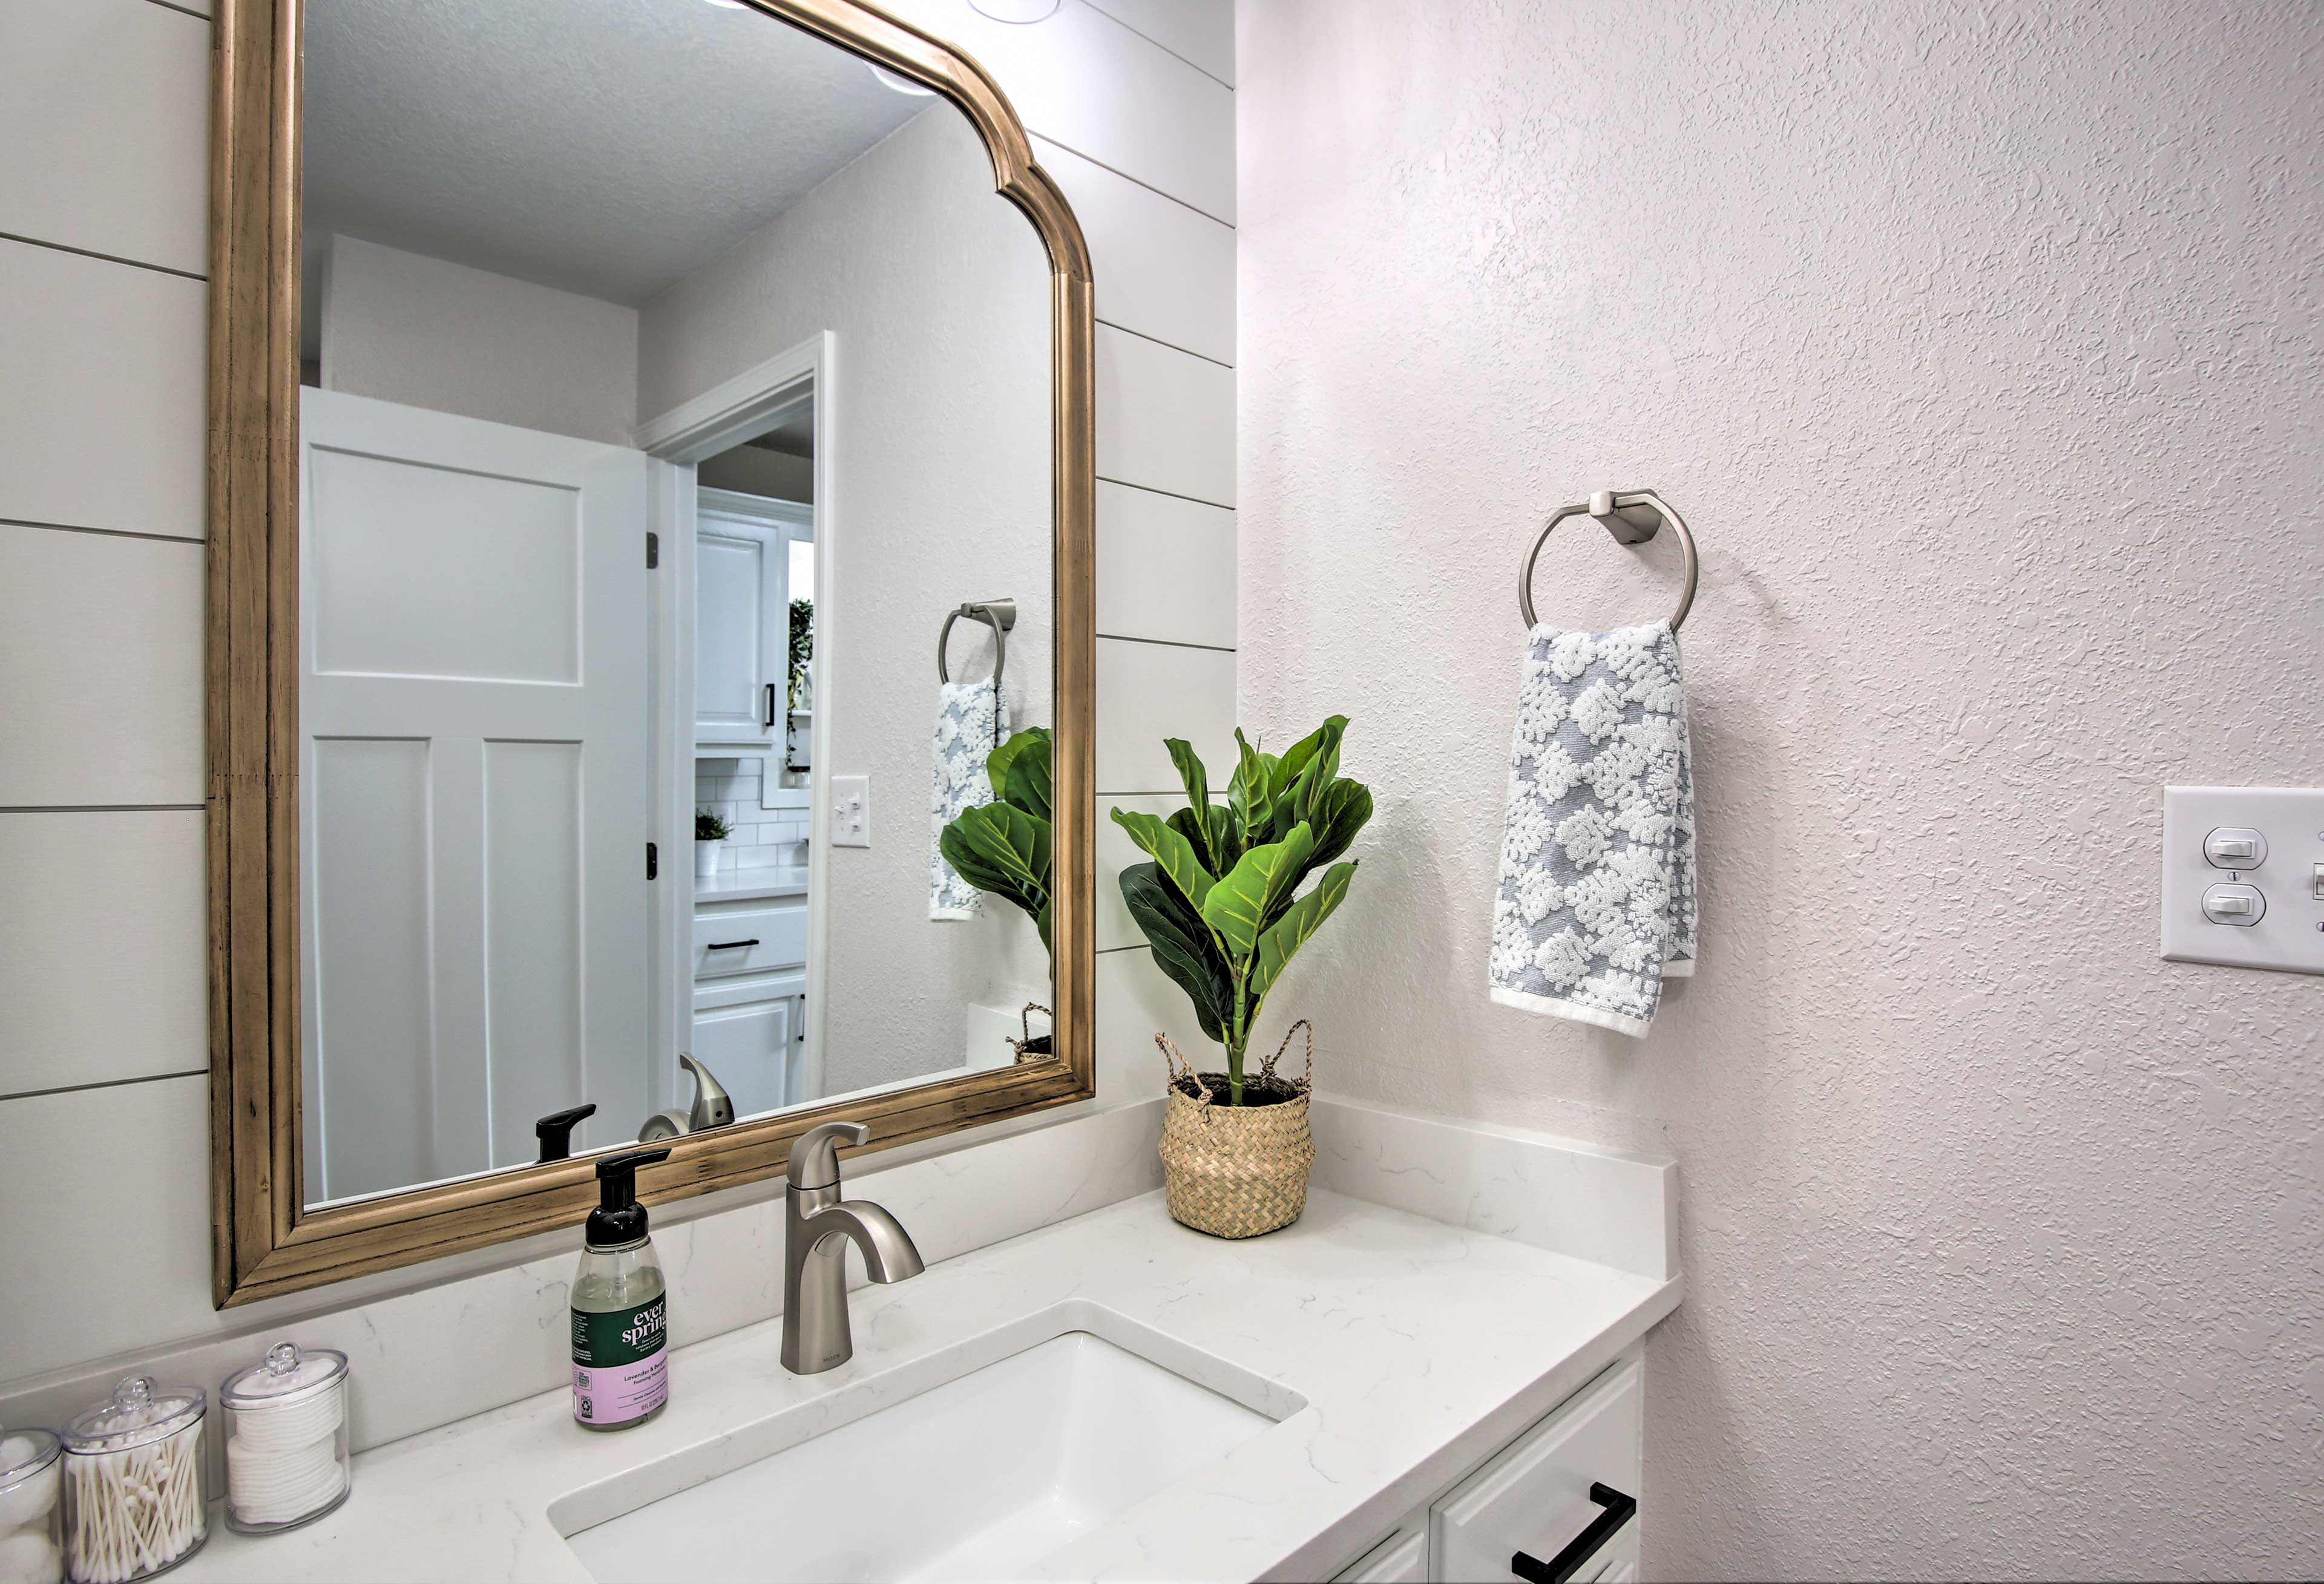 En-Suite Bathroom   Linens & Towels Provided